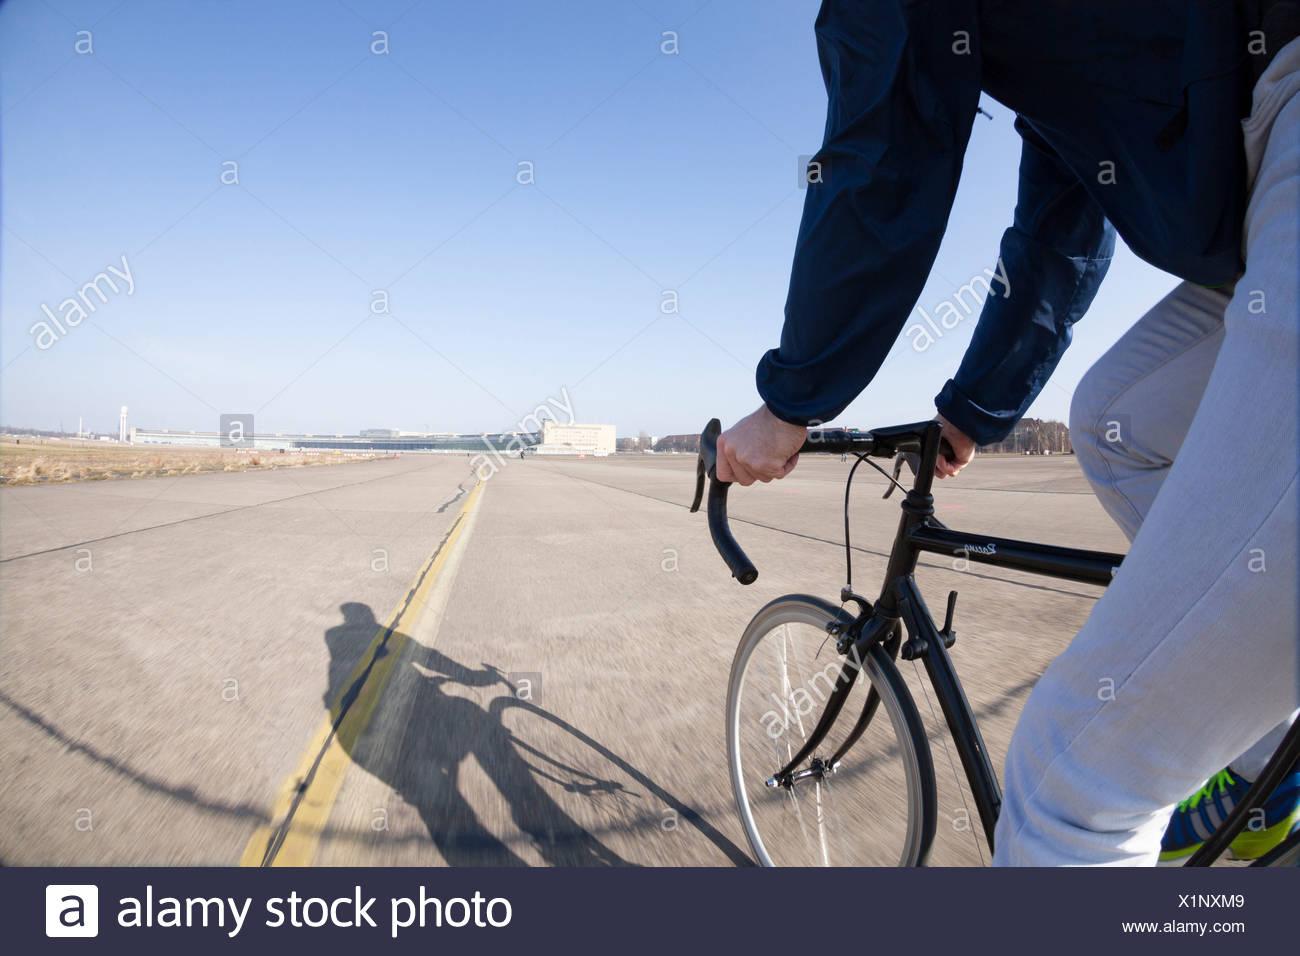 Germany, Berlin, racing biker driving at Tempelhofer Feld formerly Berlin Tempelhof Airport, partial view - Stock Image